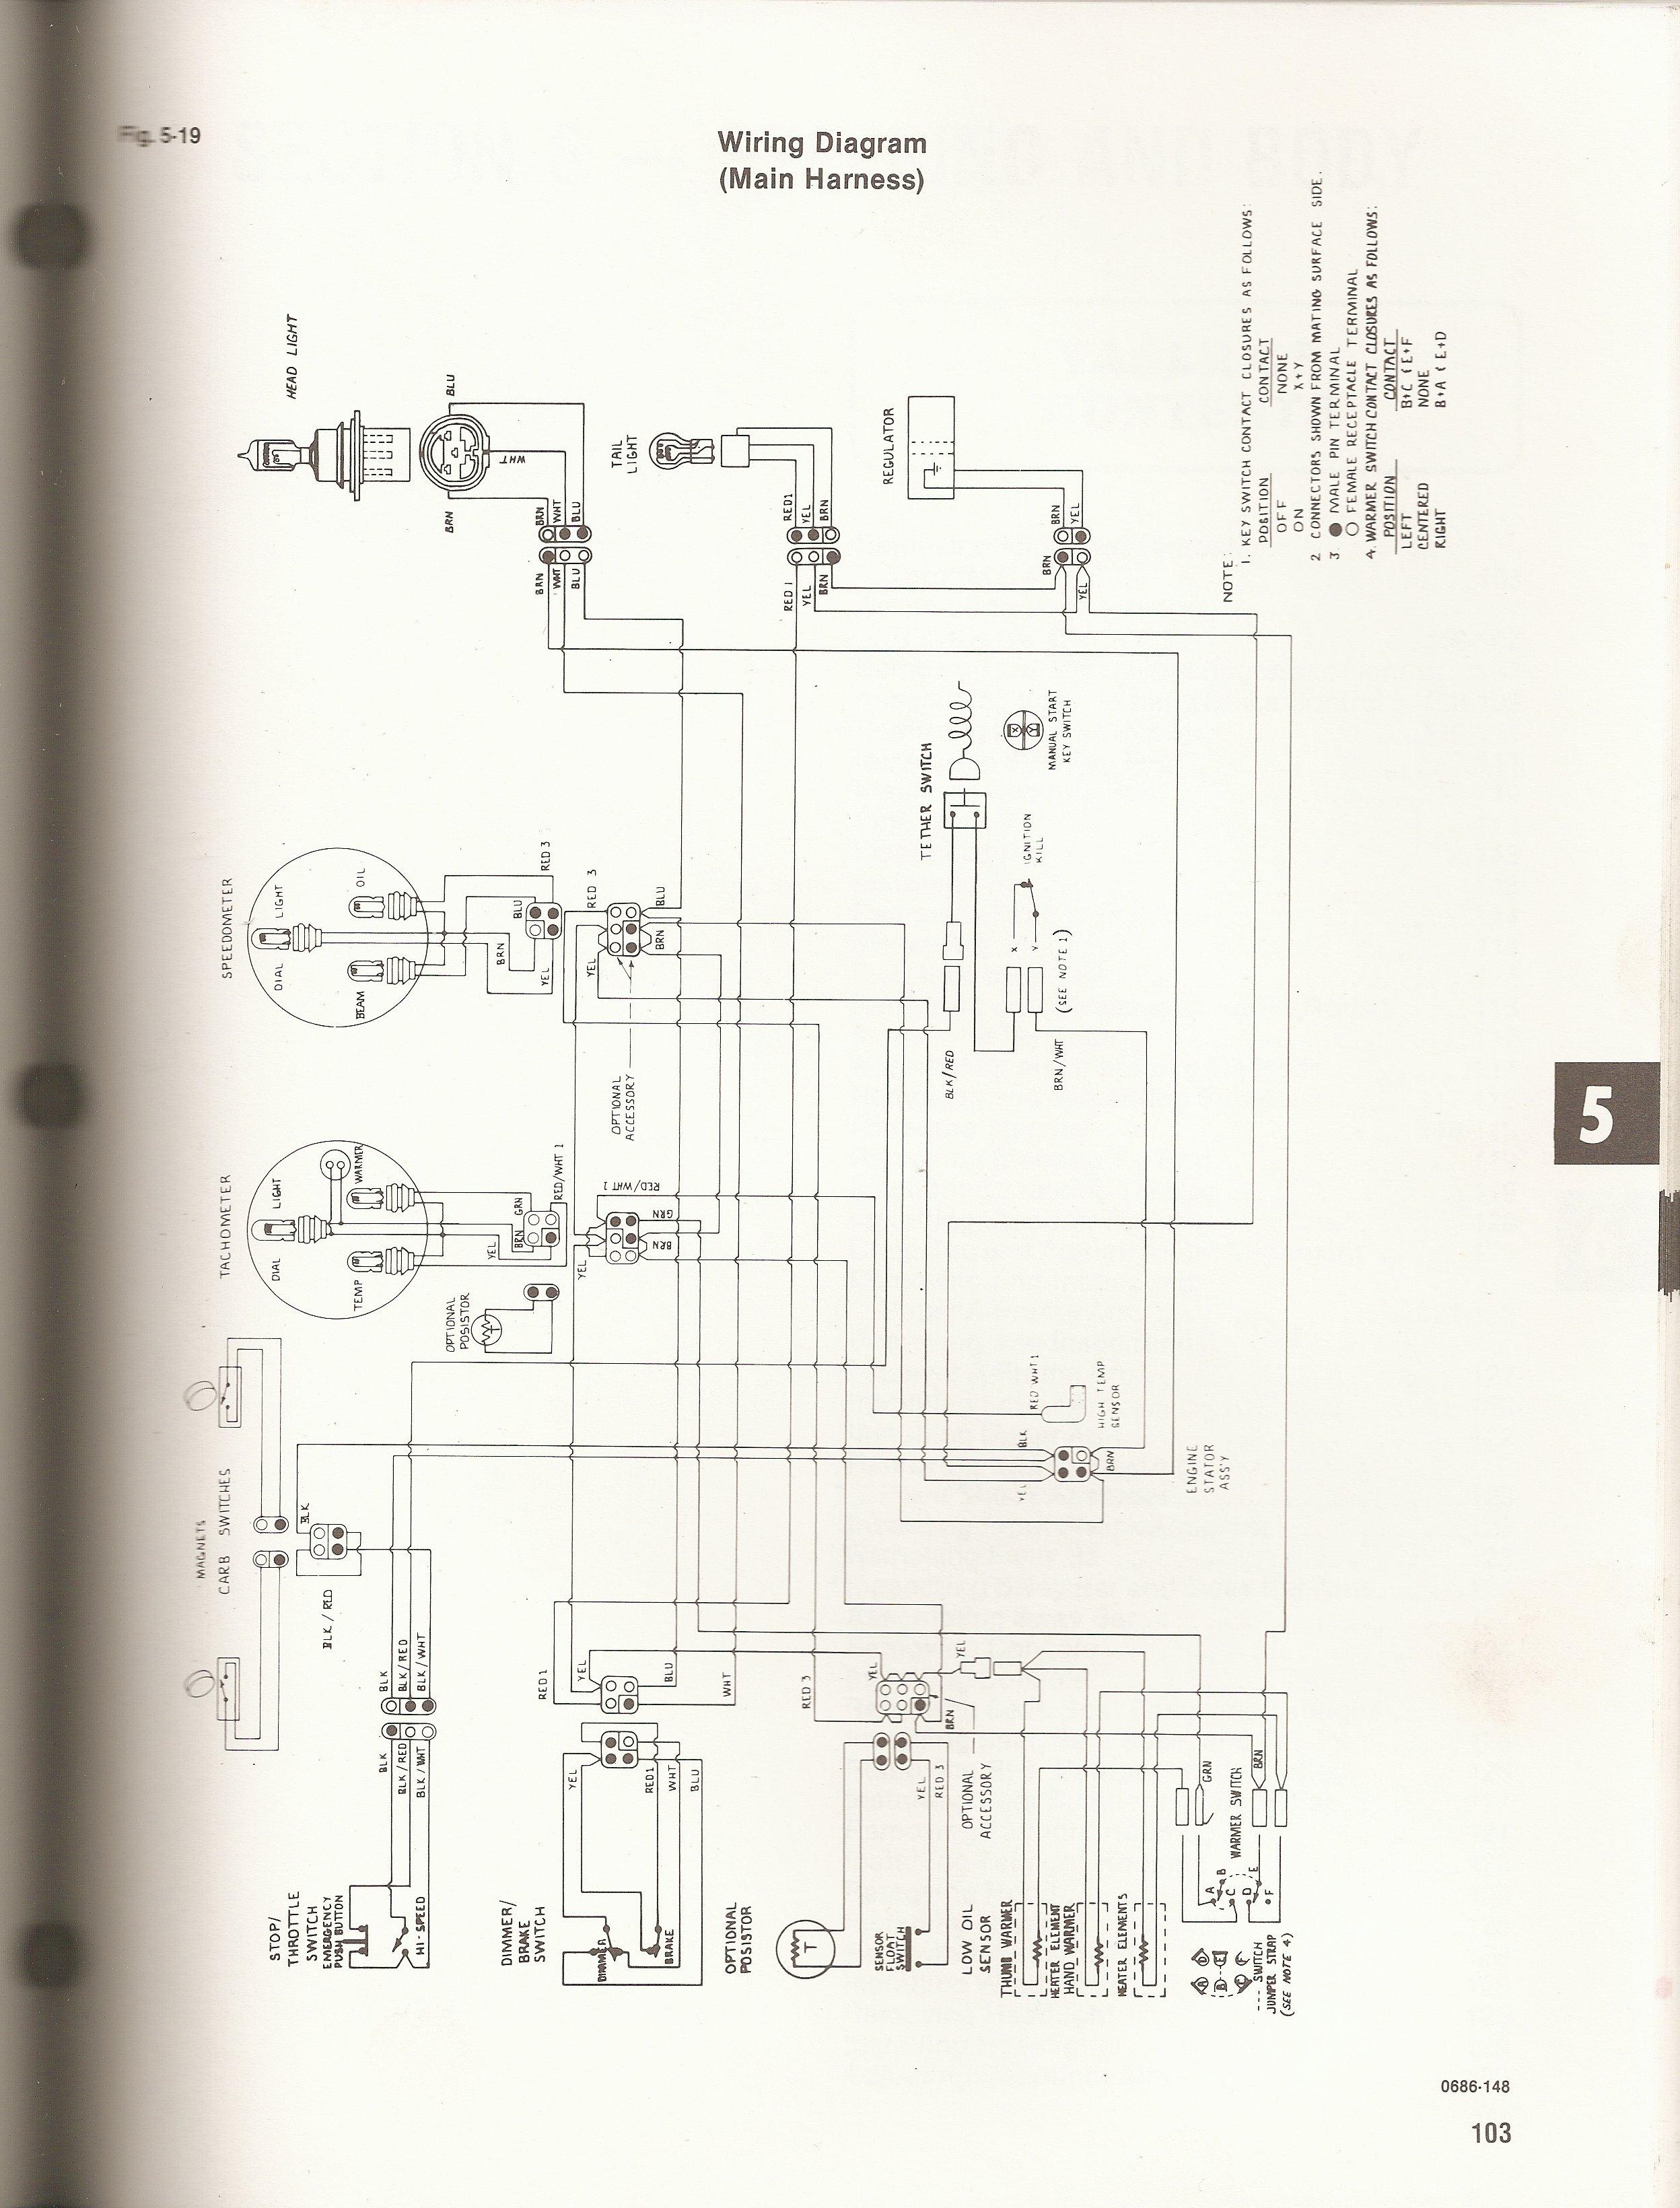 92 Cougar Wiring Diagram - Today Wiring Diagram - Ez Go Golf Cart Battery Wiring Diagram